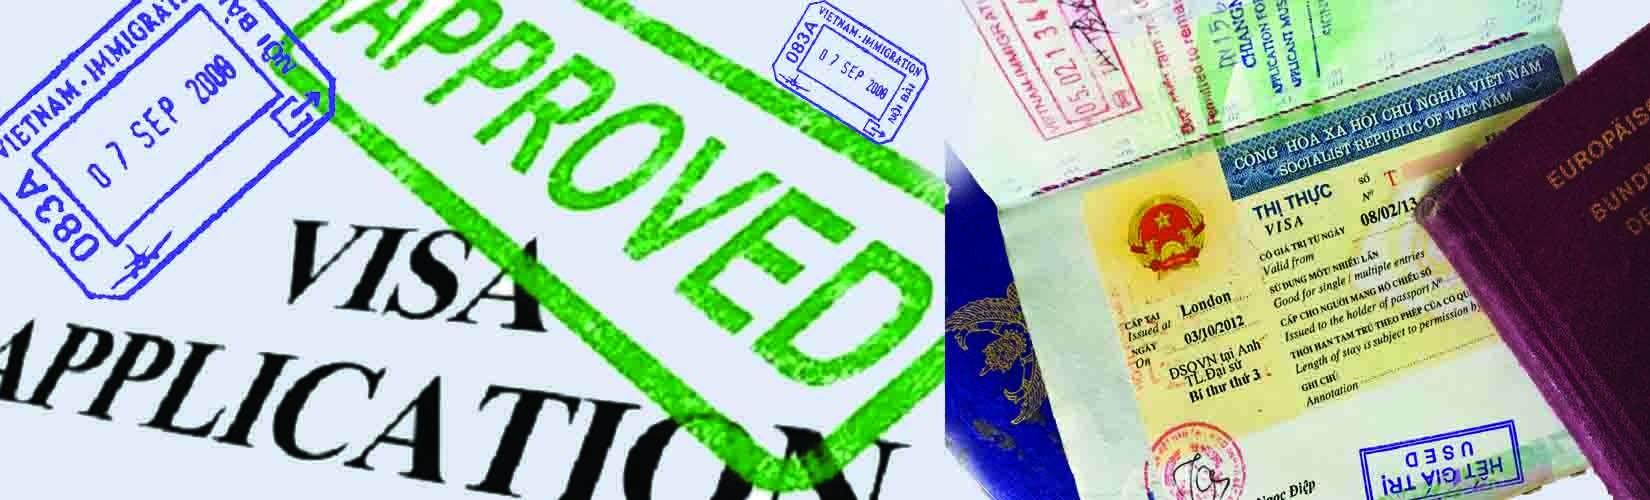 Vietnam Travel Info: Complete Vietnam Tourist Visa Information